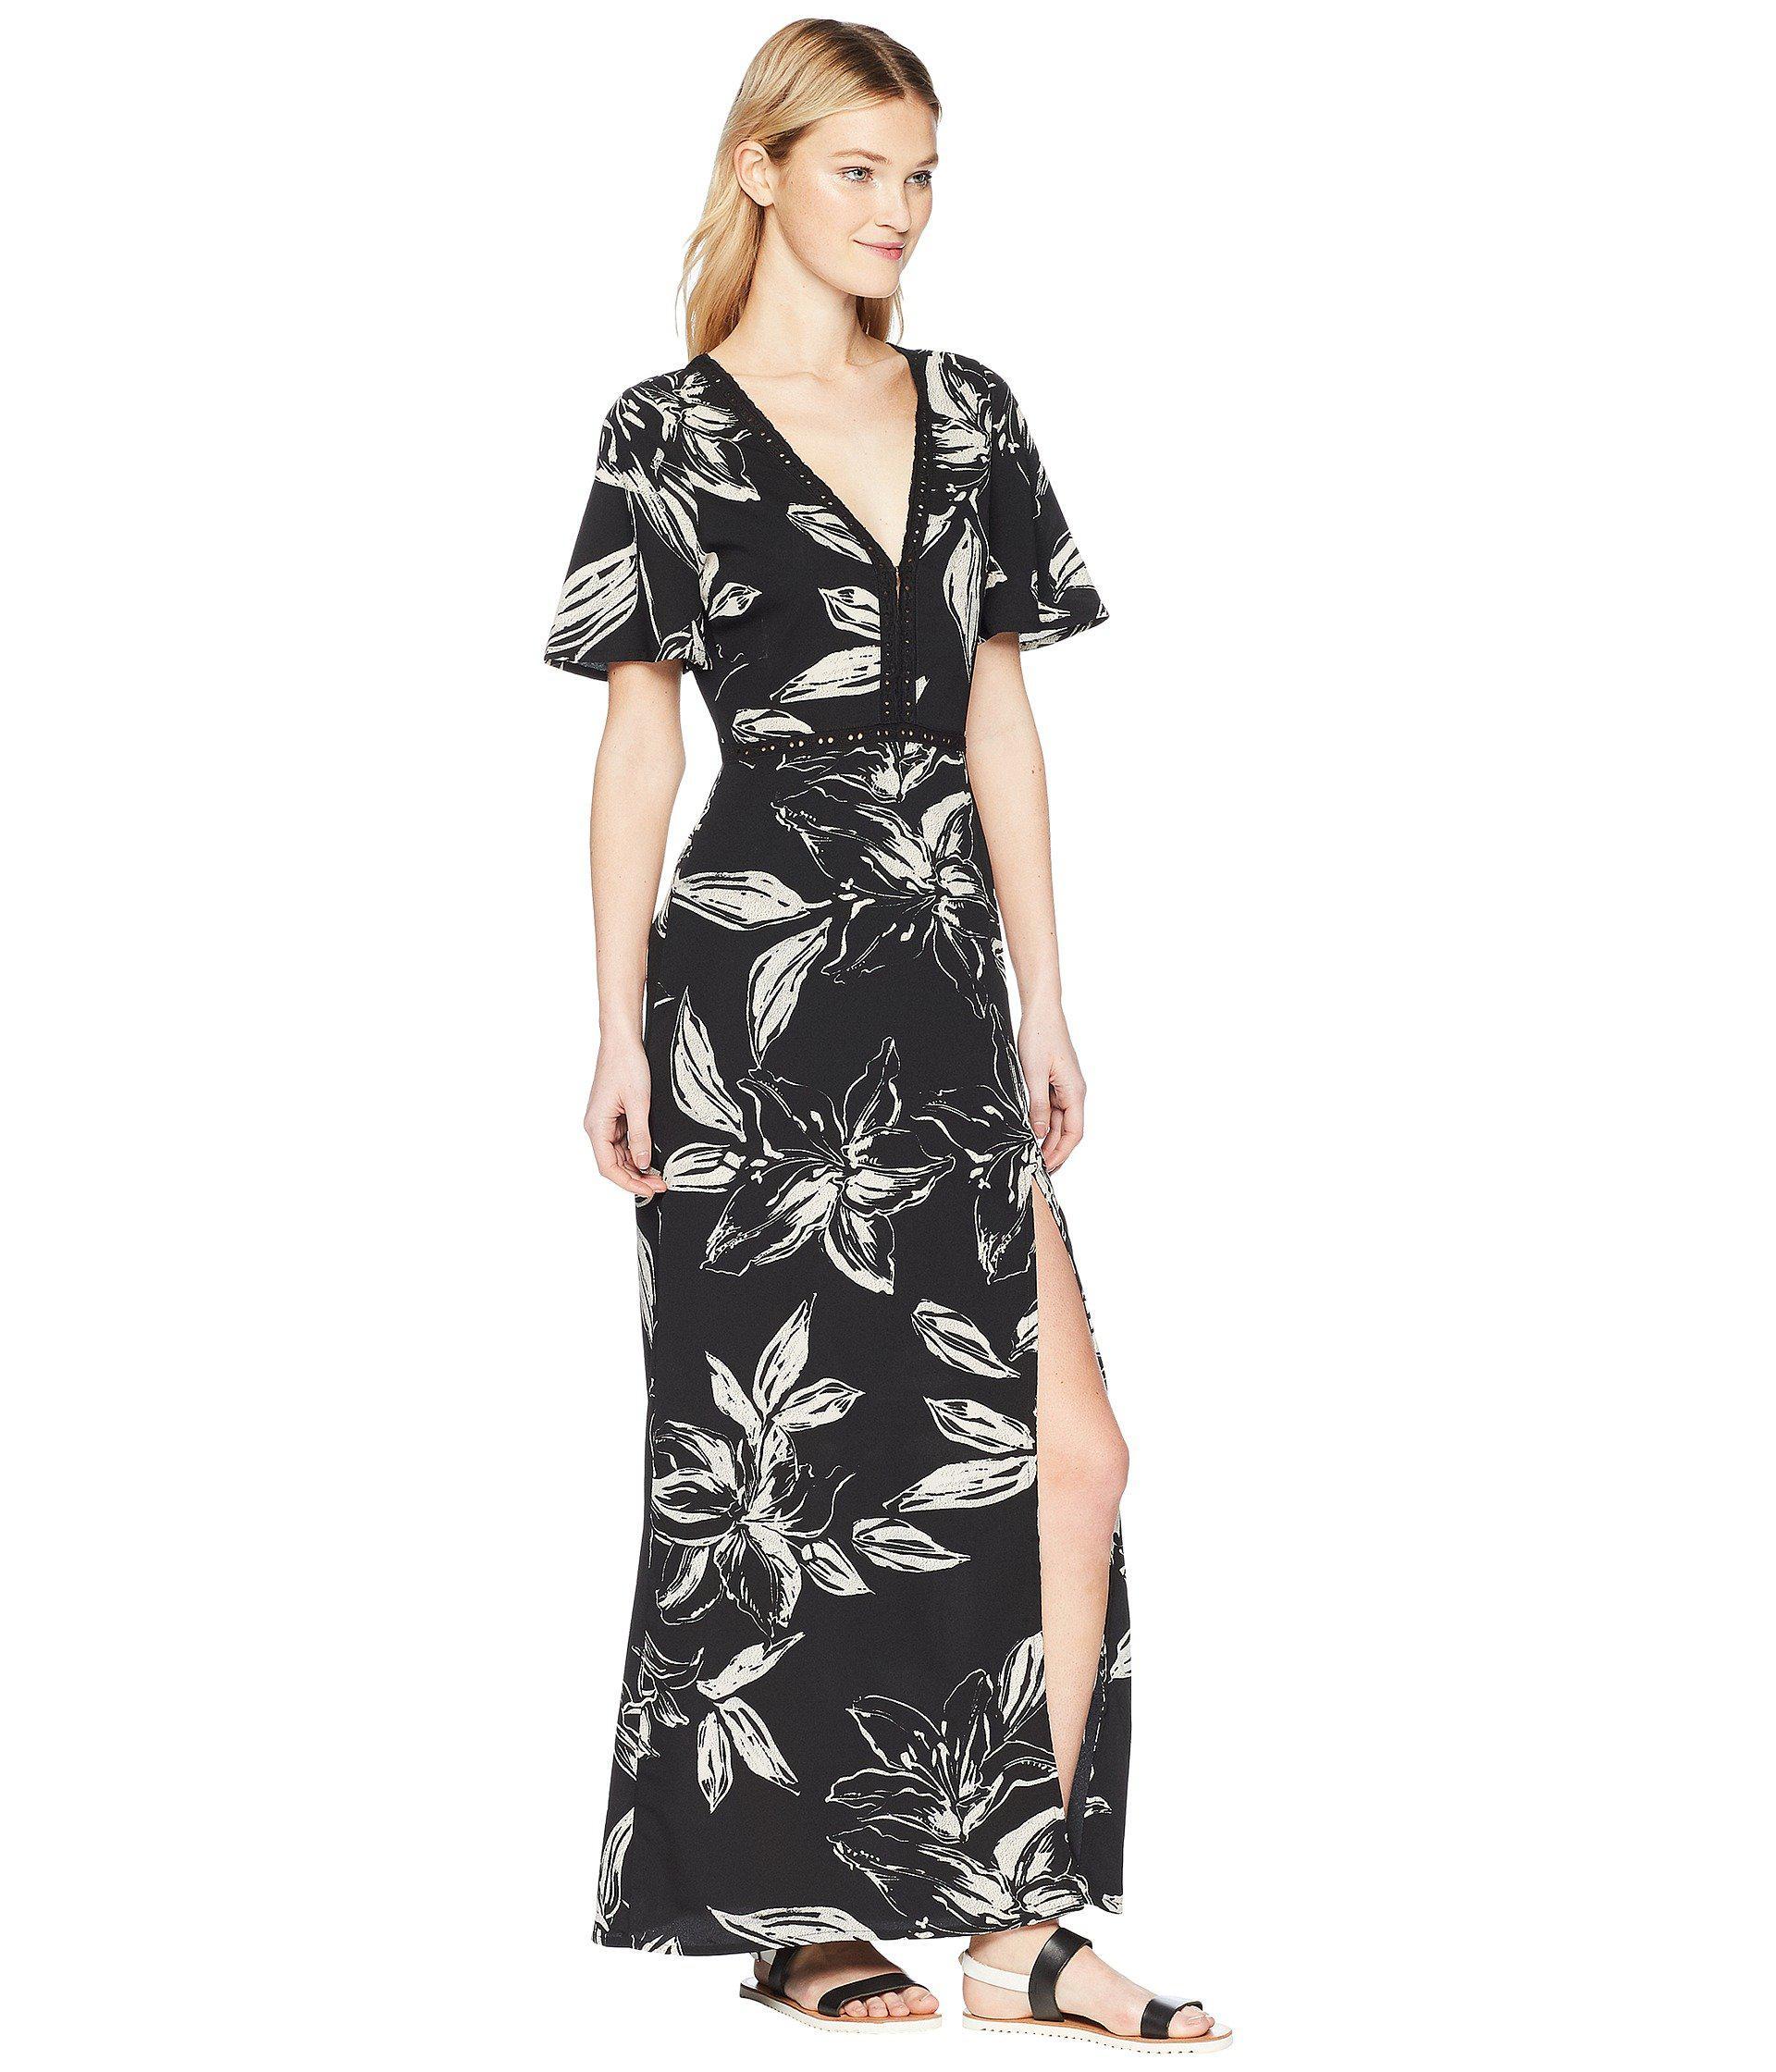 504c0500bd5787 Amuse Society - Black Seaside Dress - Lyst. View fullscreen